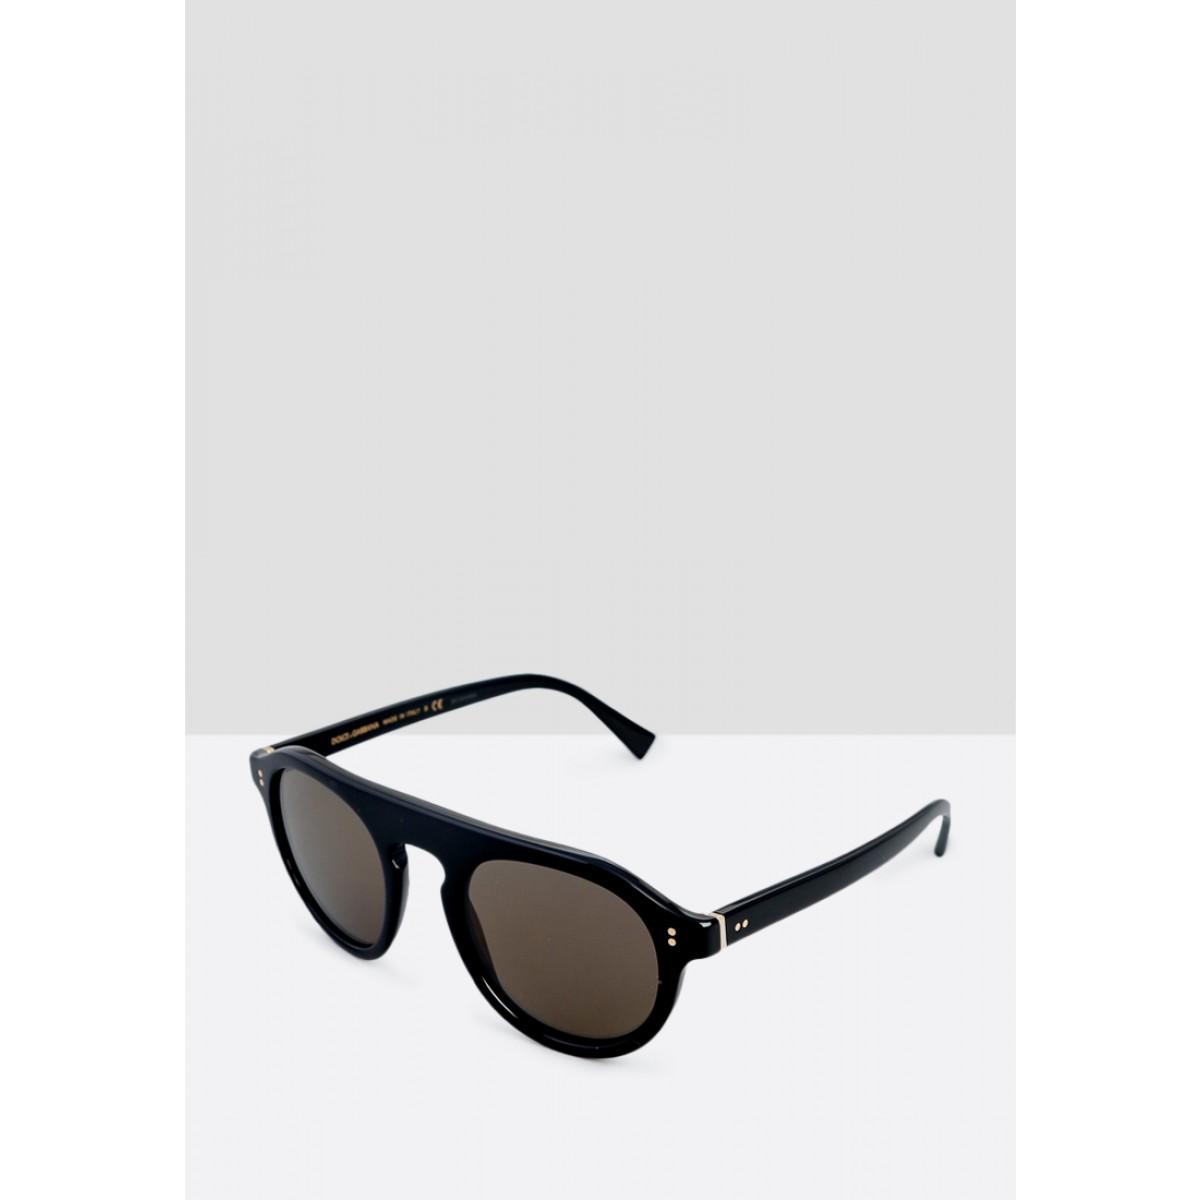 2b012178724c Dolce   Gabbana Black Aviator Men Sunglasses DG4306-501 R5-50 ...